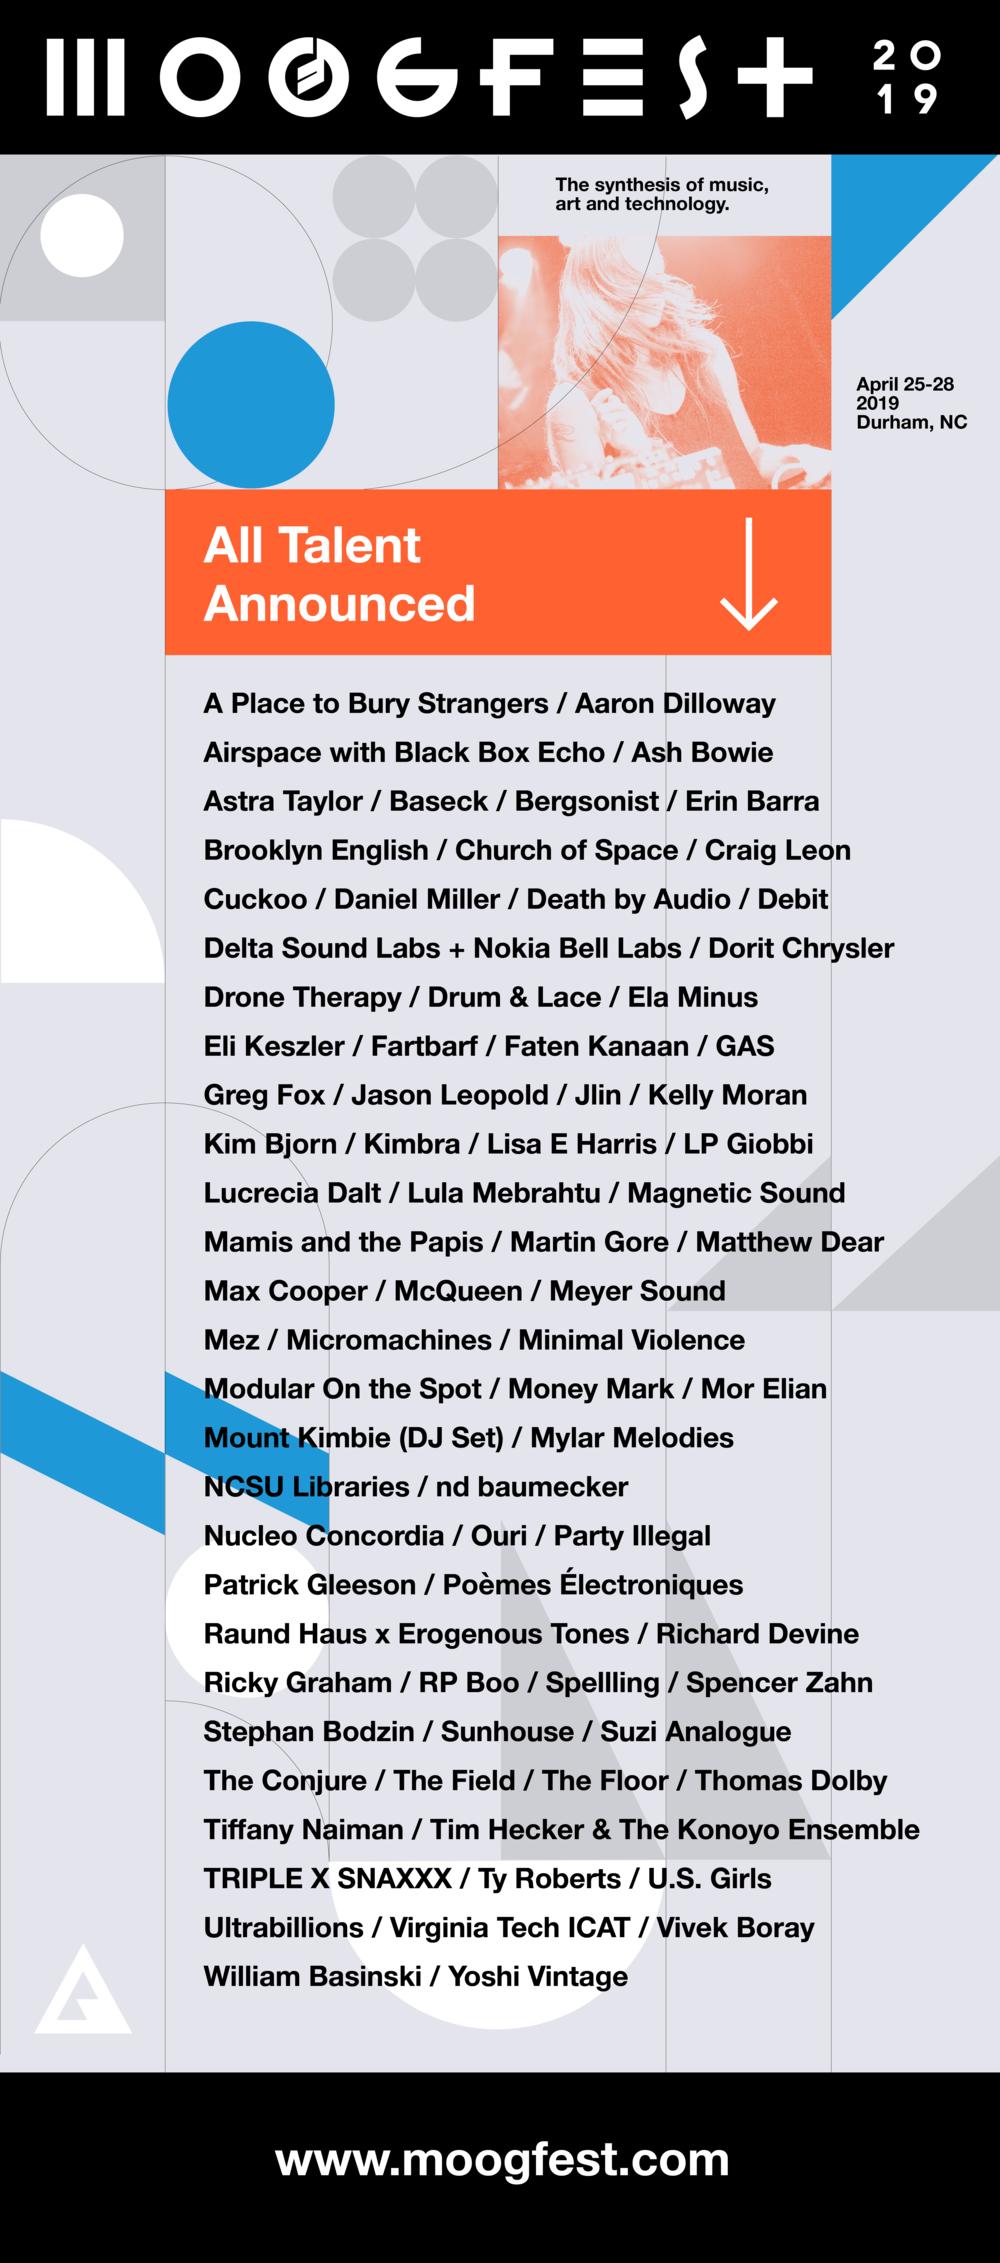 Moogfest 2019_Lineup Annoucement_190326.png